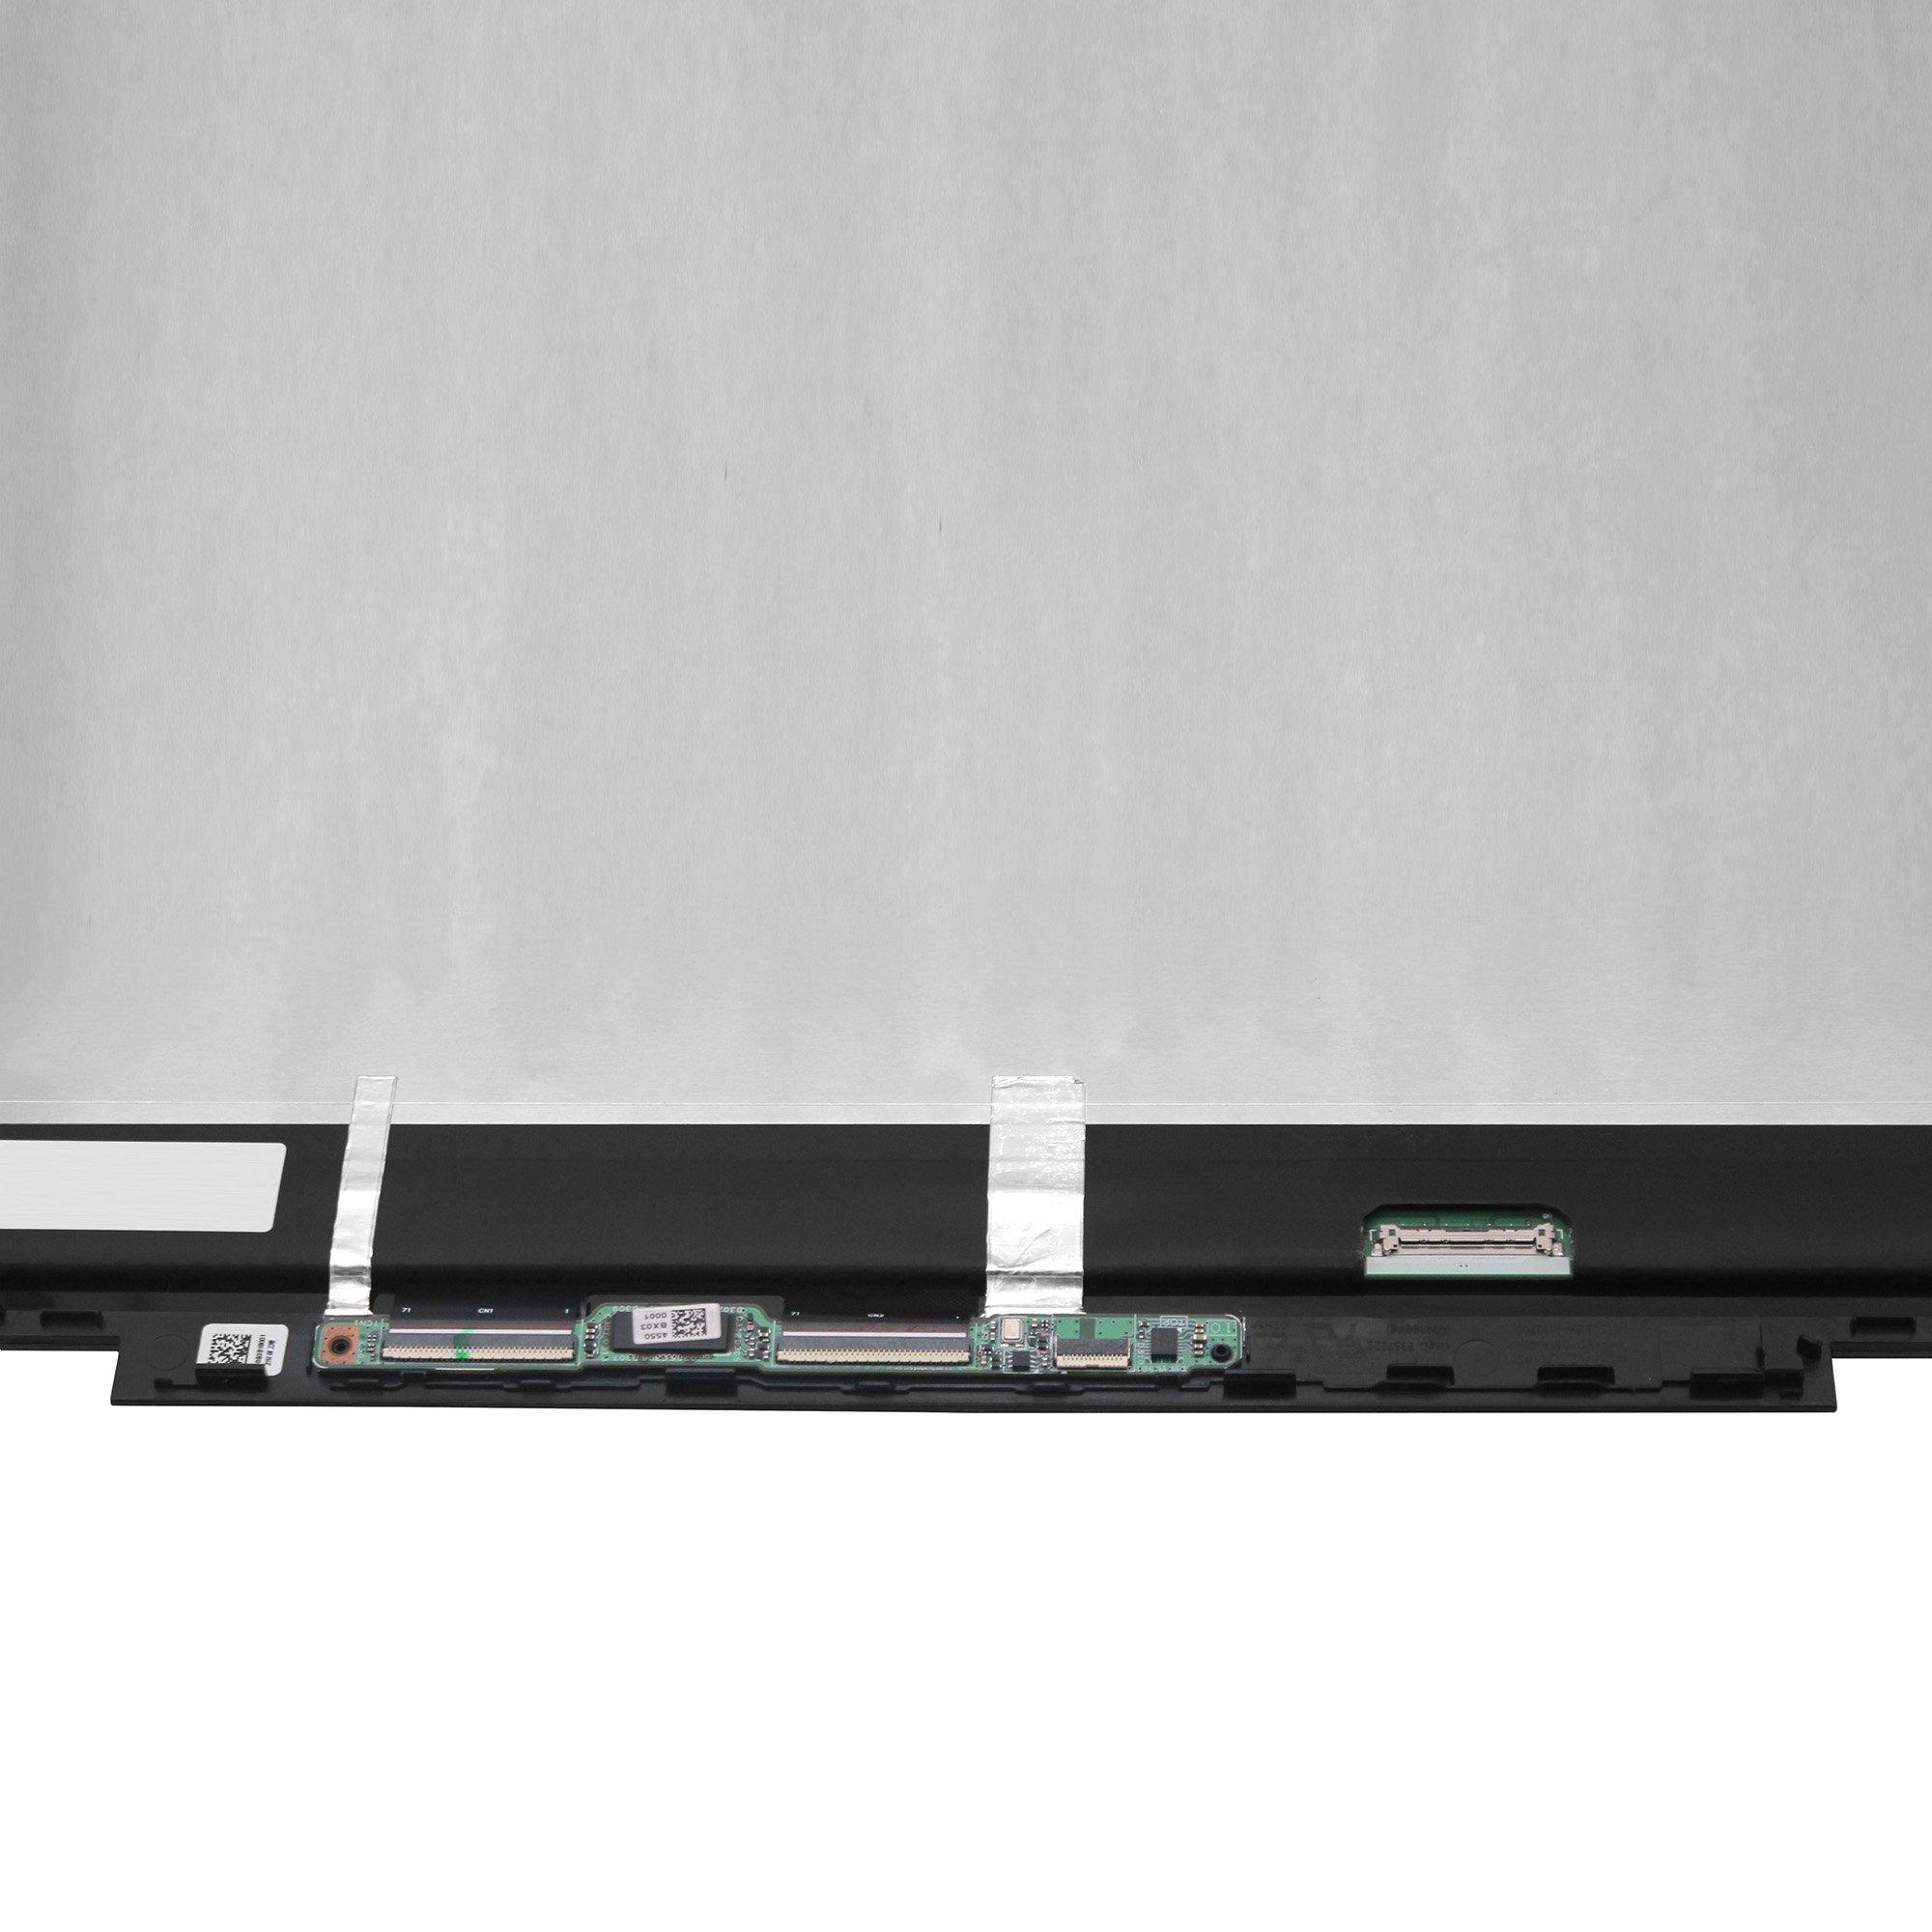 LCDOLED 15.6'' FullHD IPS LCD Touch Screen Digitizer Assembly + Bezel + Board for HP Envy x360 15-bq 15-bq000 15-bq100 15m-bq000 15m-bq100 15m-bq021dx 15m-bq121dx 15-bq175nr 15-bq075nr 15-bq051nr by LCDOLED (Image #3)